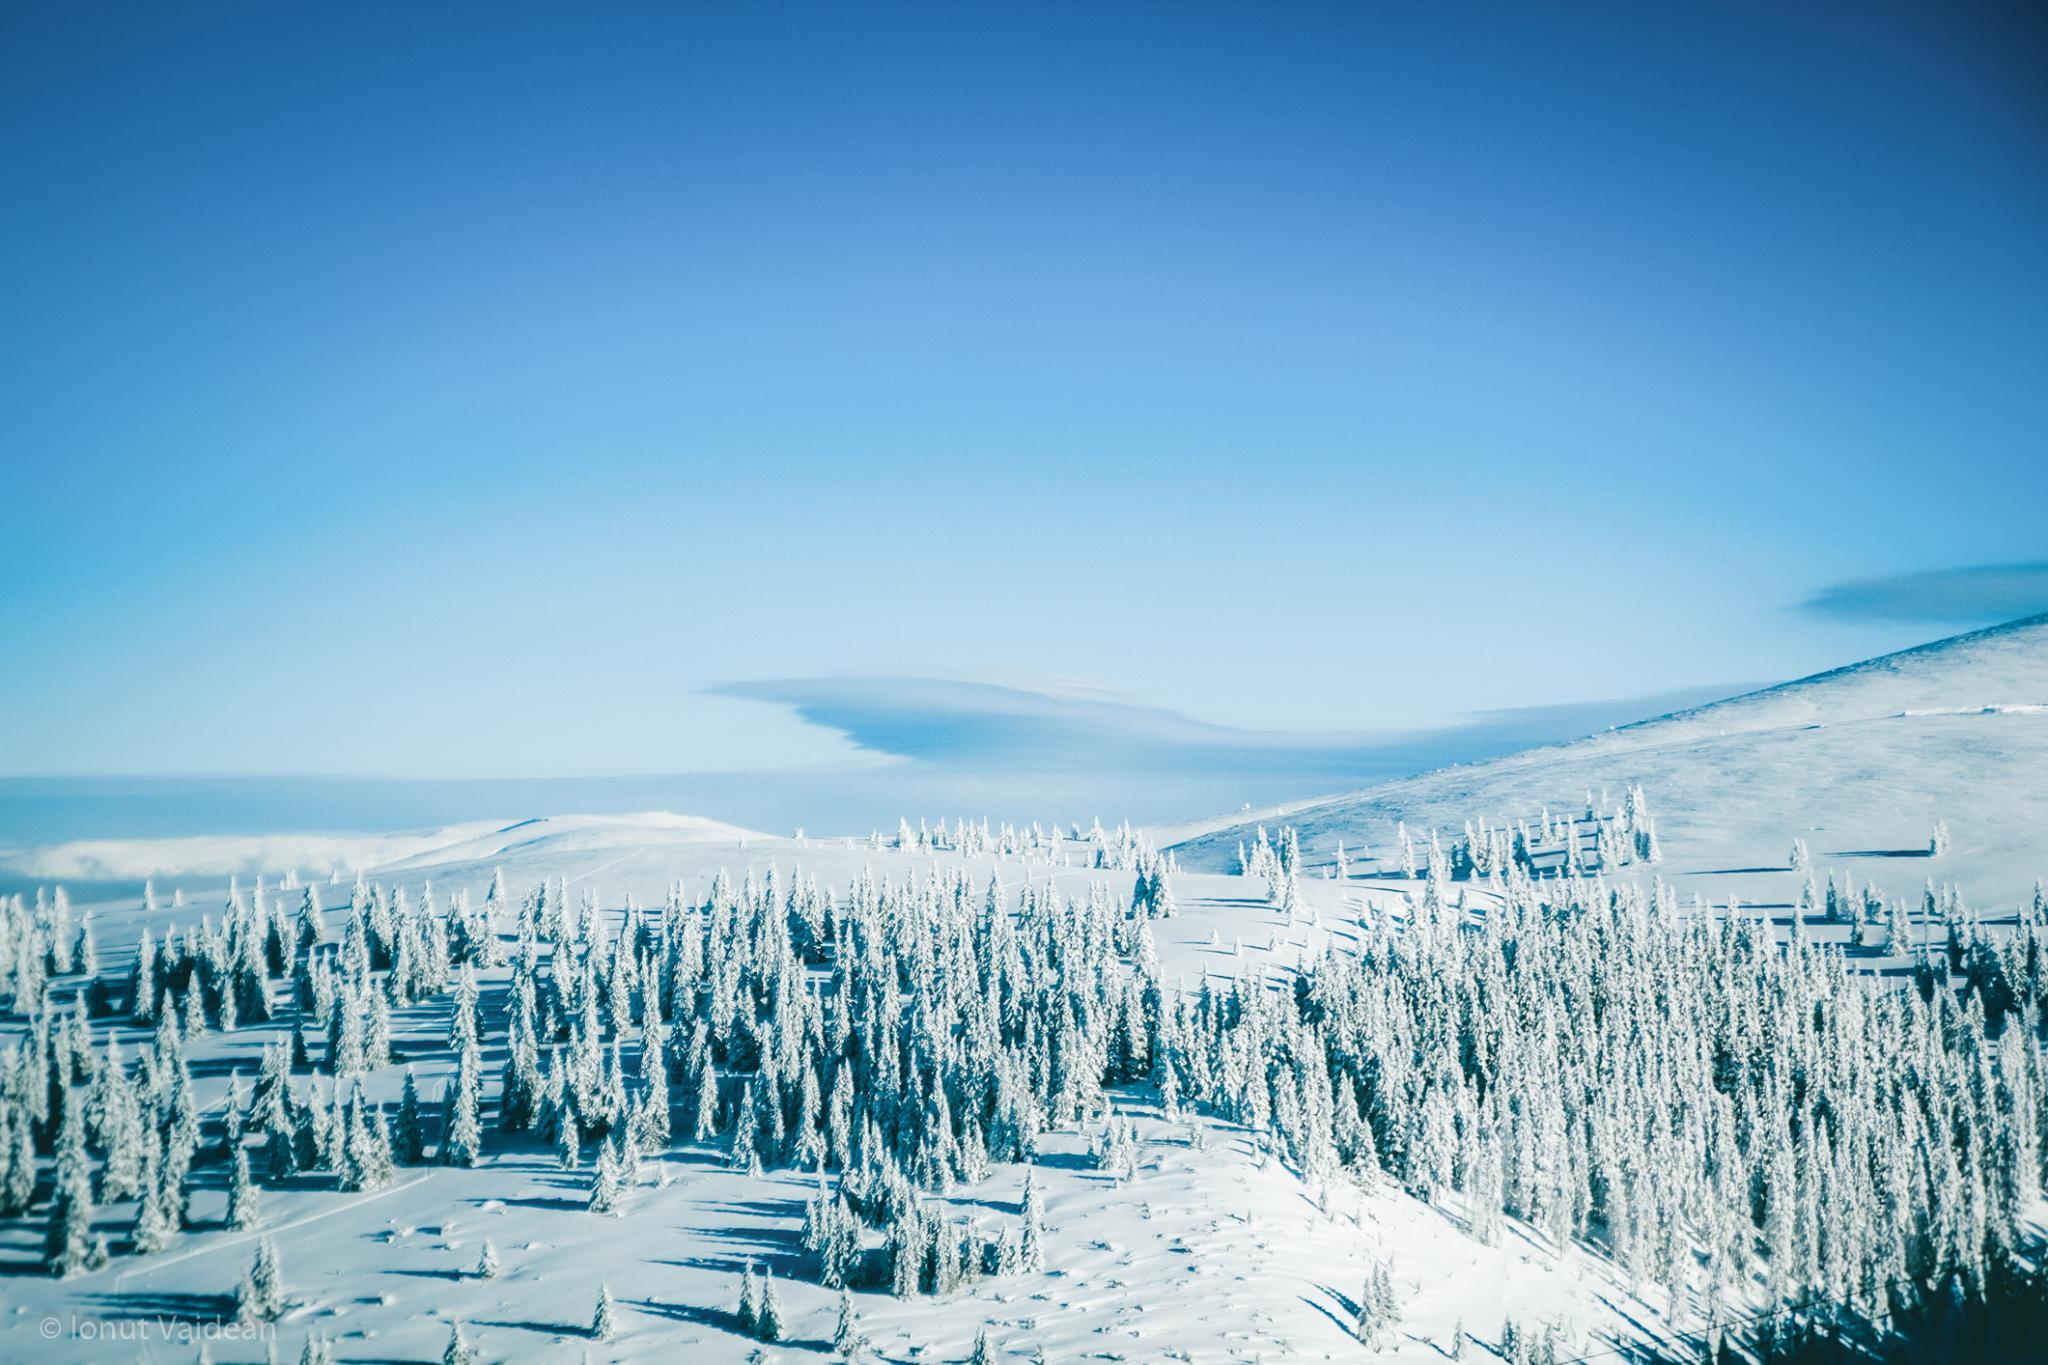 Photo: Ionut Vaidean